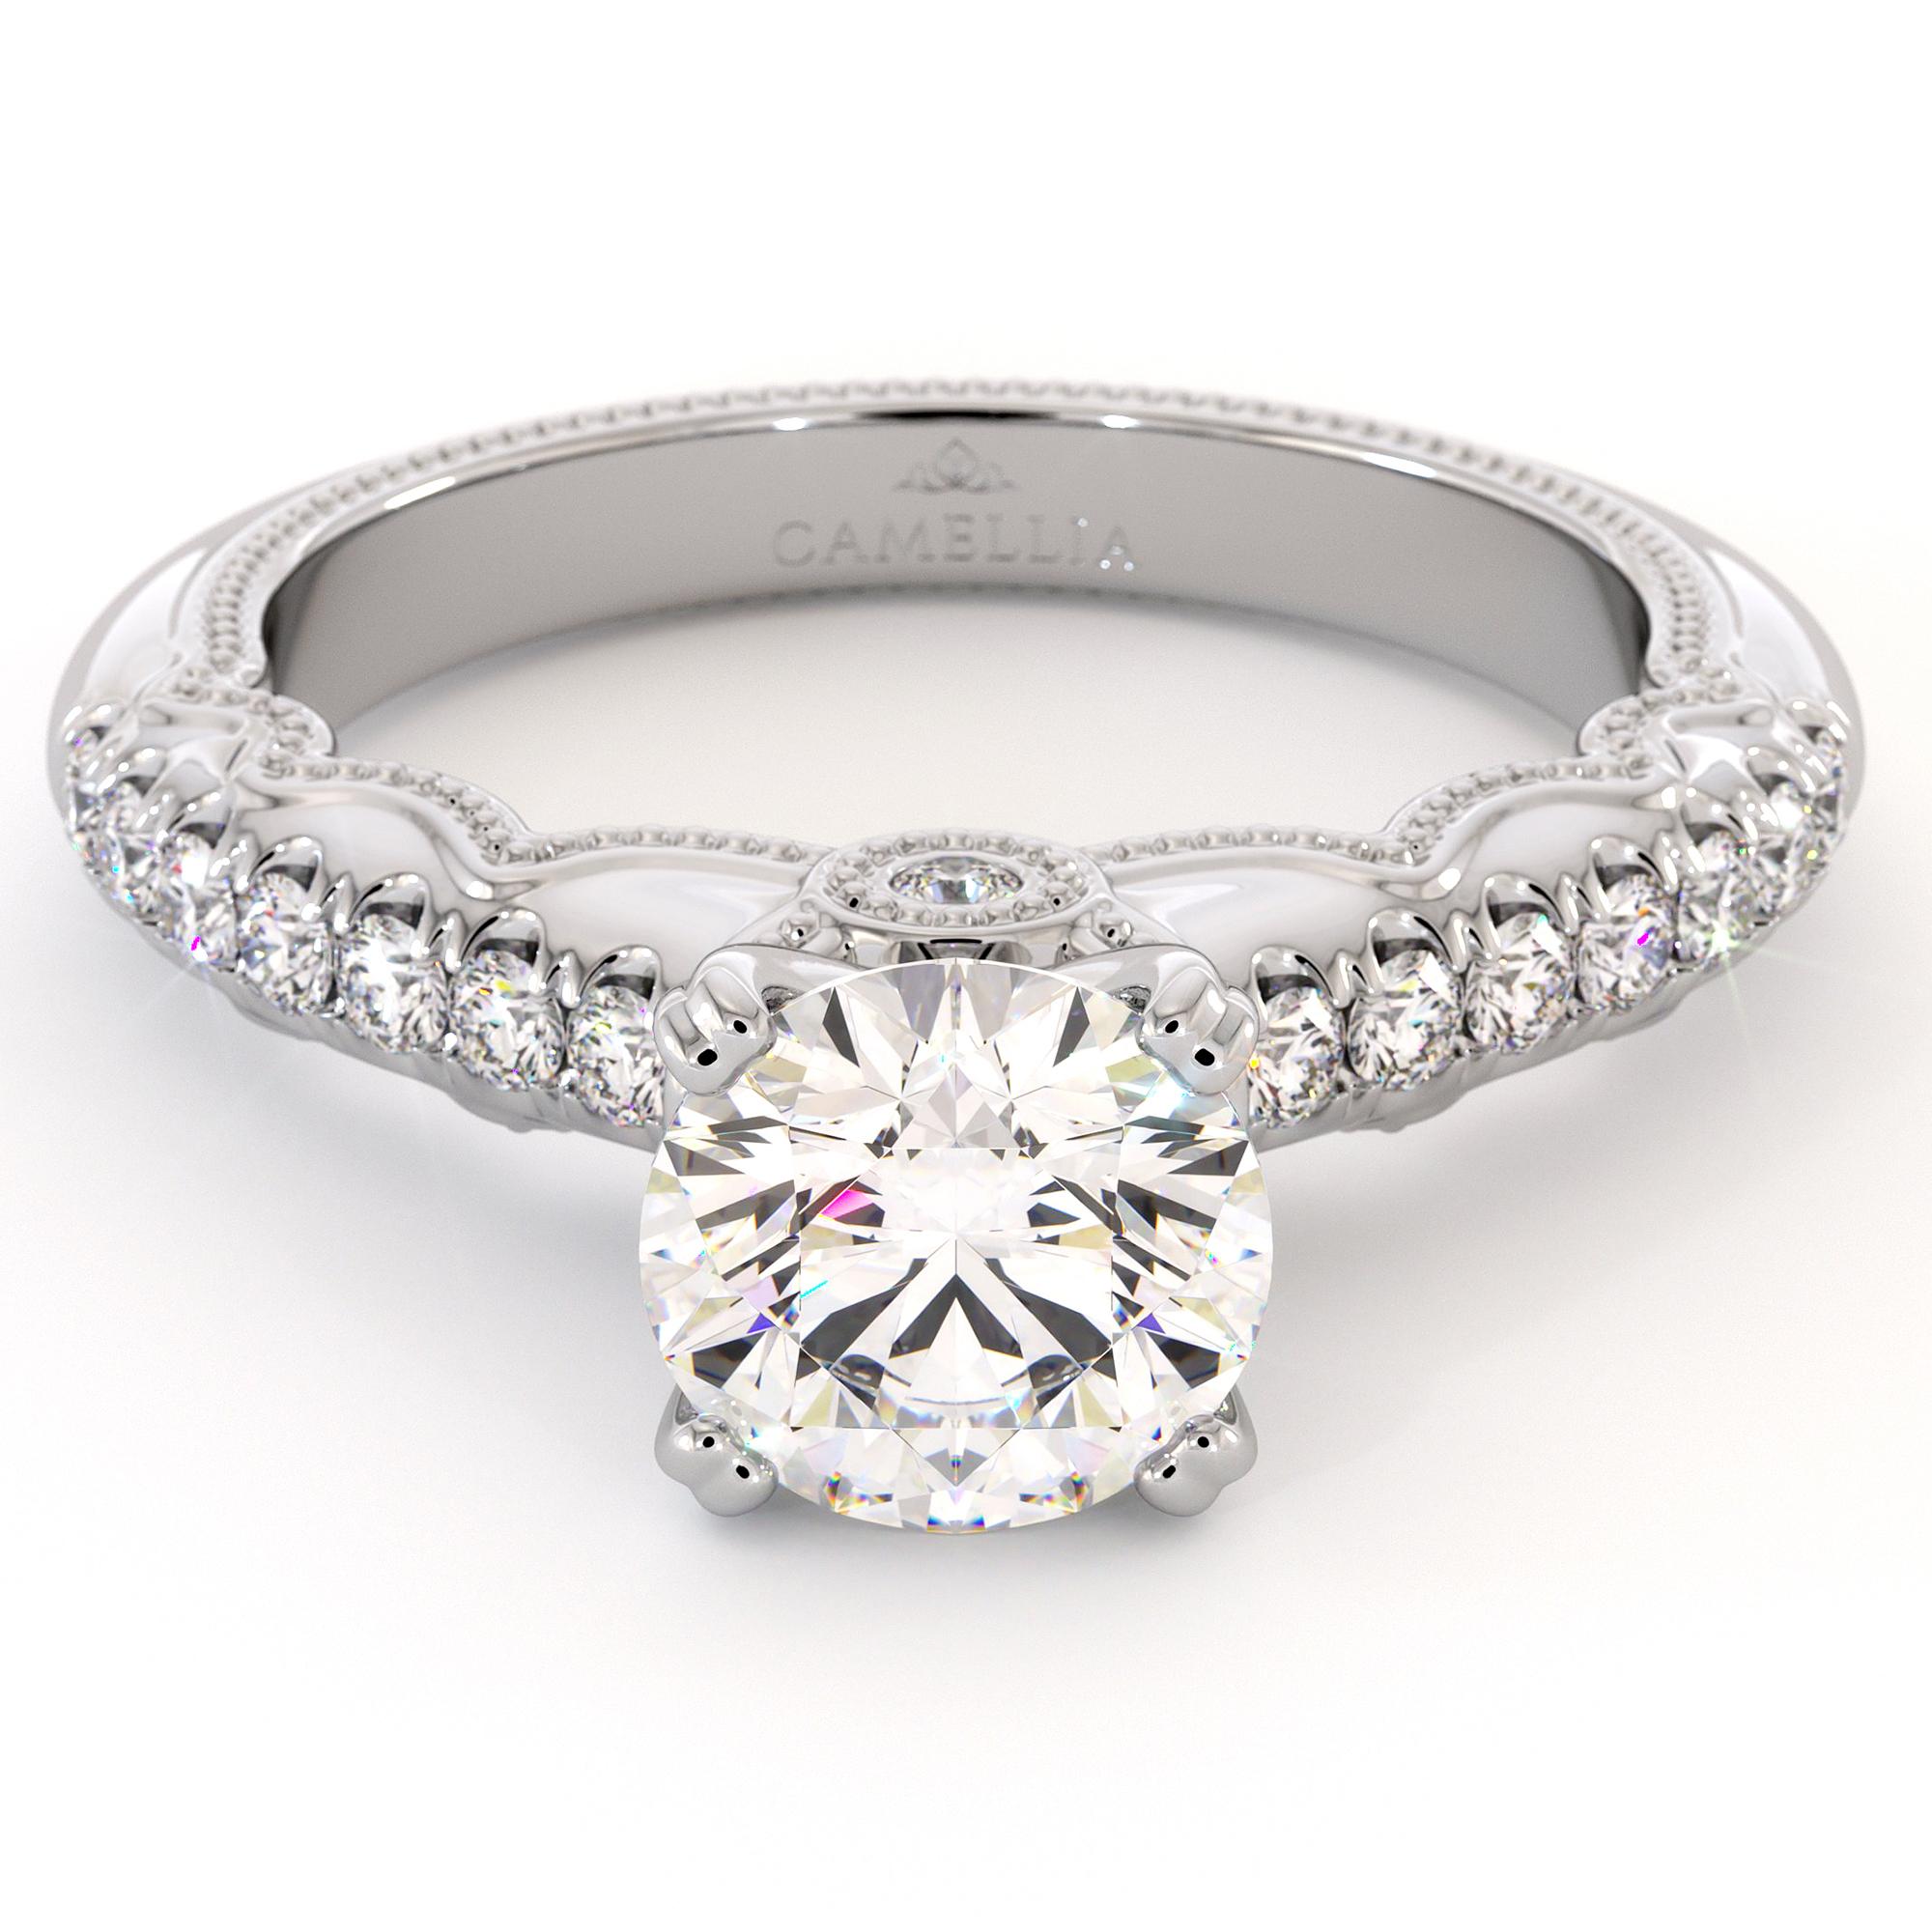 Diamond Pave Engagement Ring 14K White Gold Ring Victorian Bridal Ring Moissanite Engagement Ring